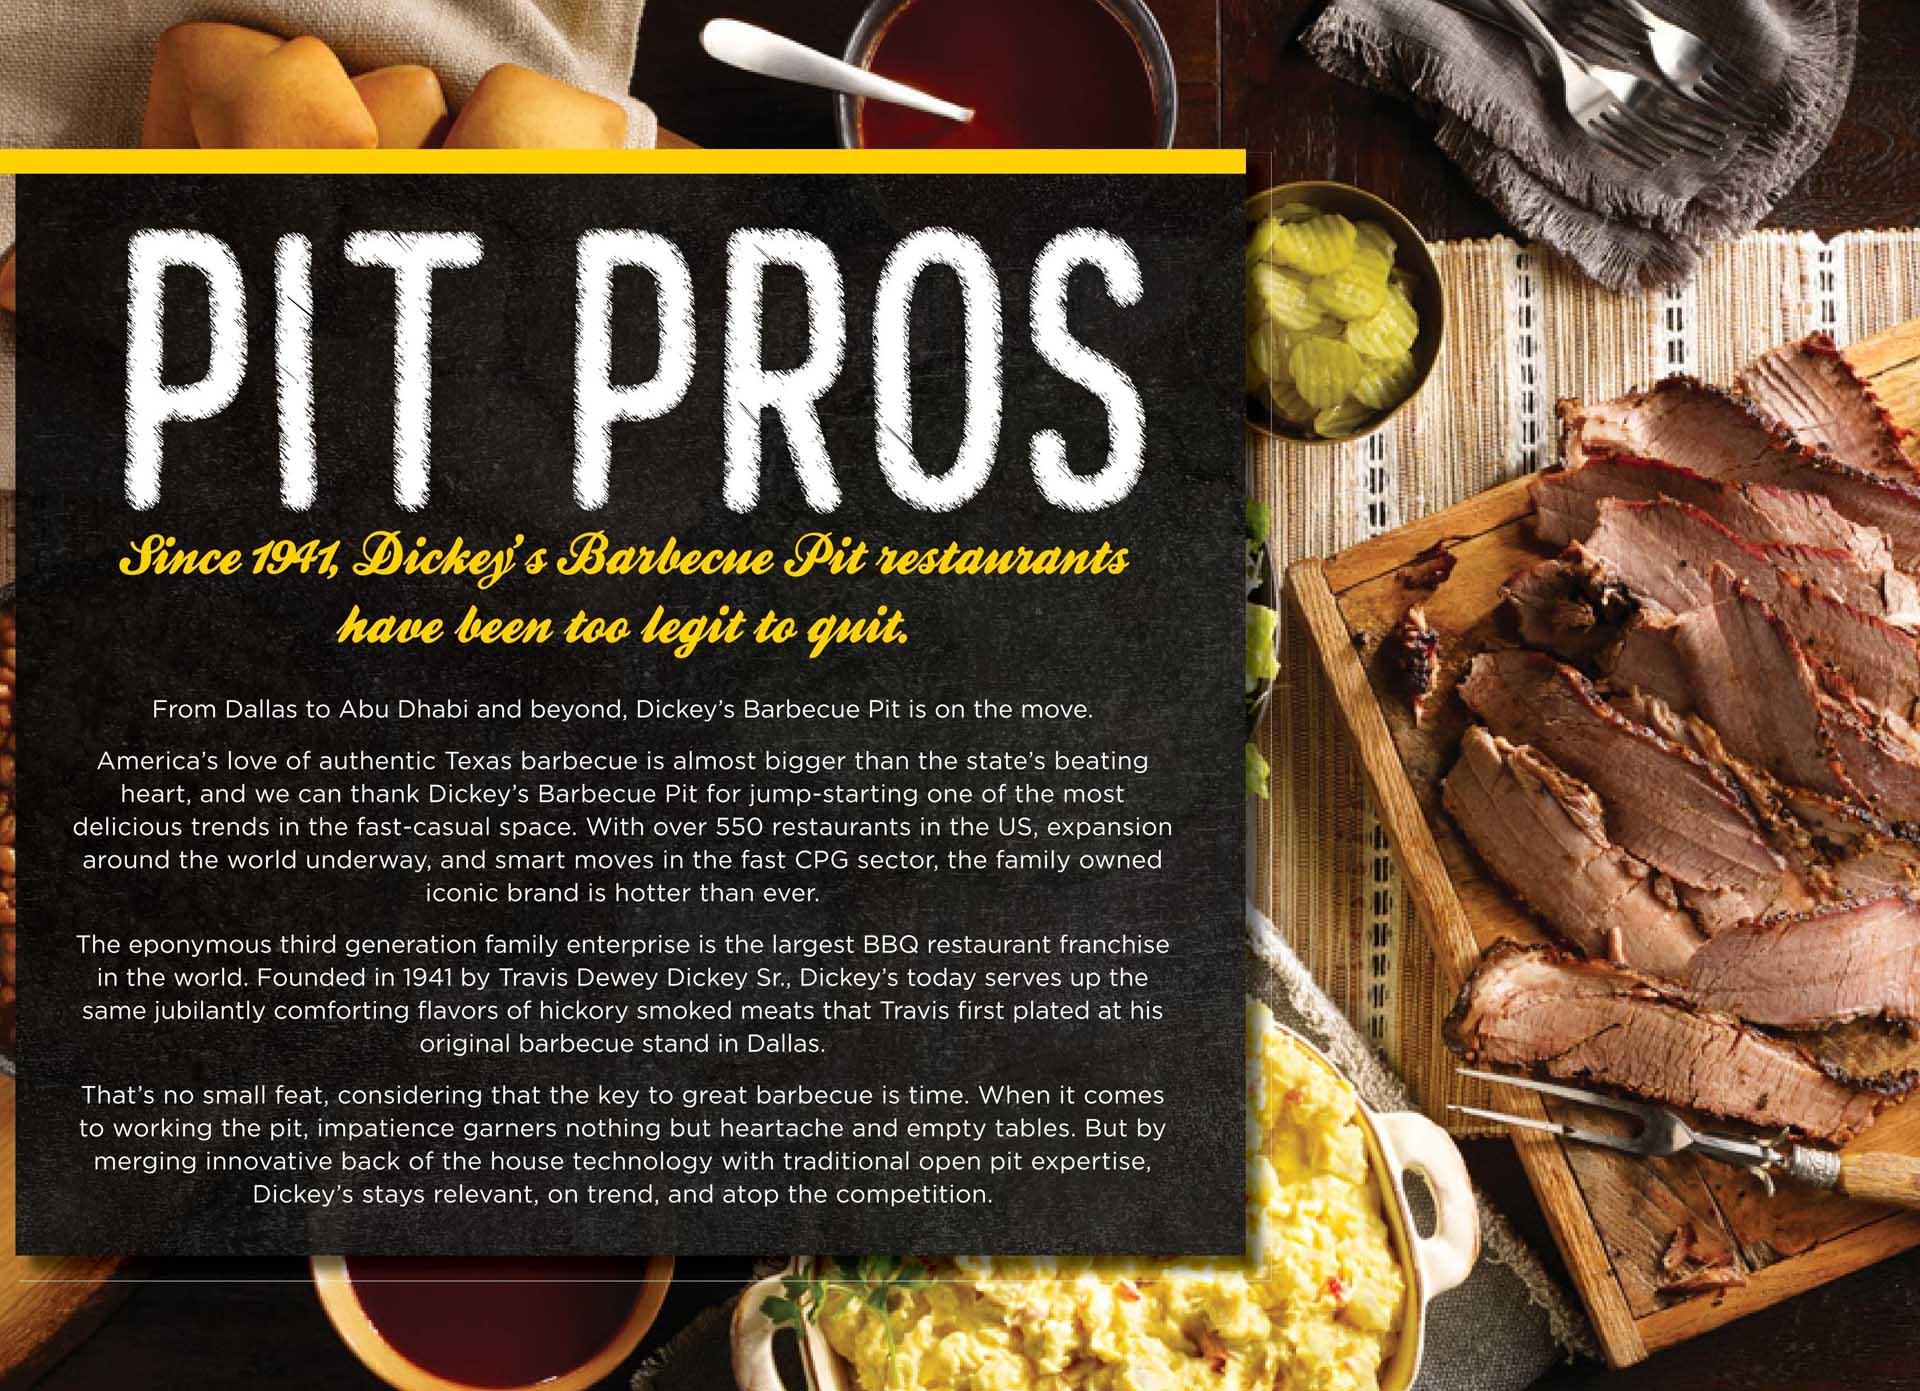 BOSS Magazine: Pit Pros